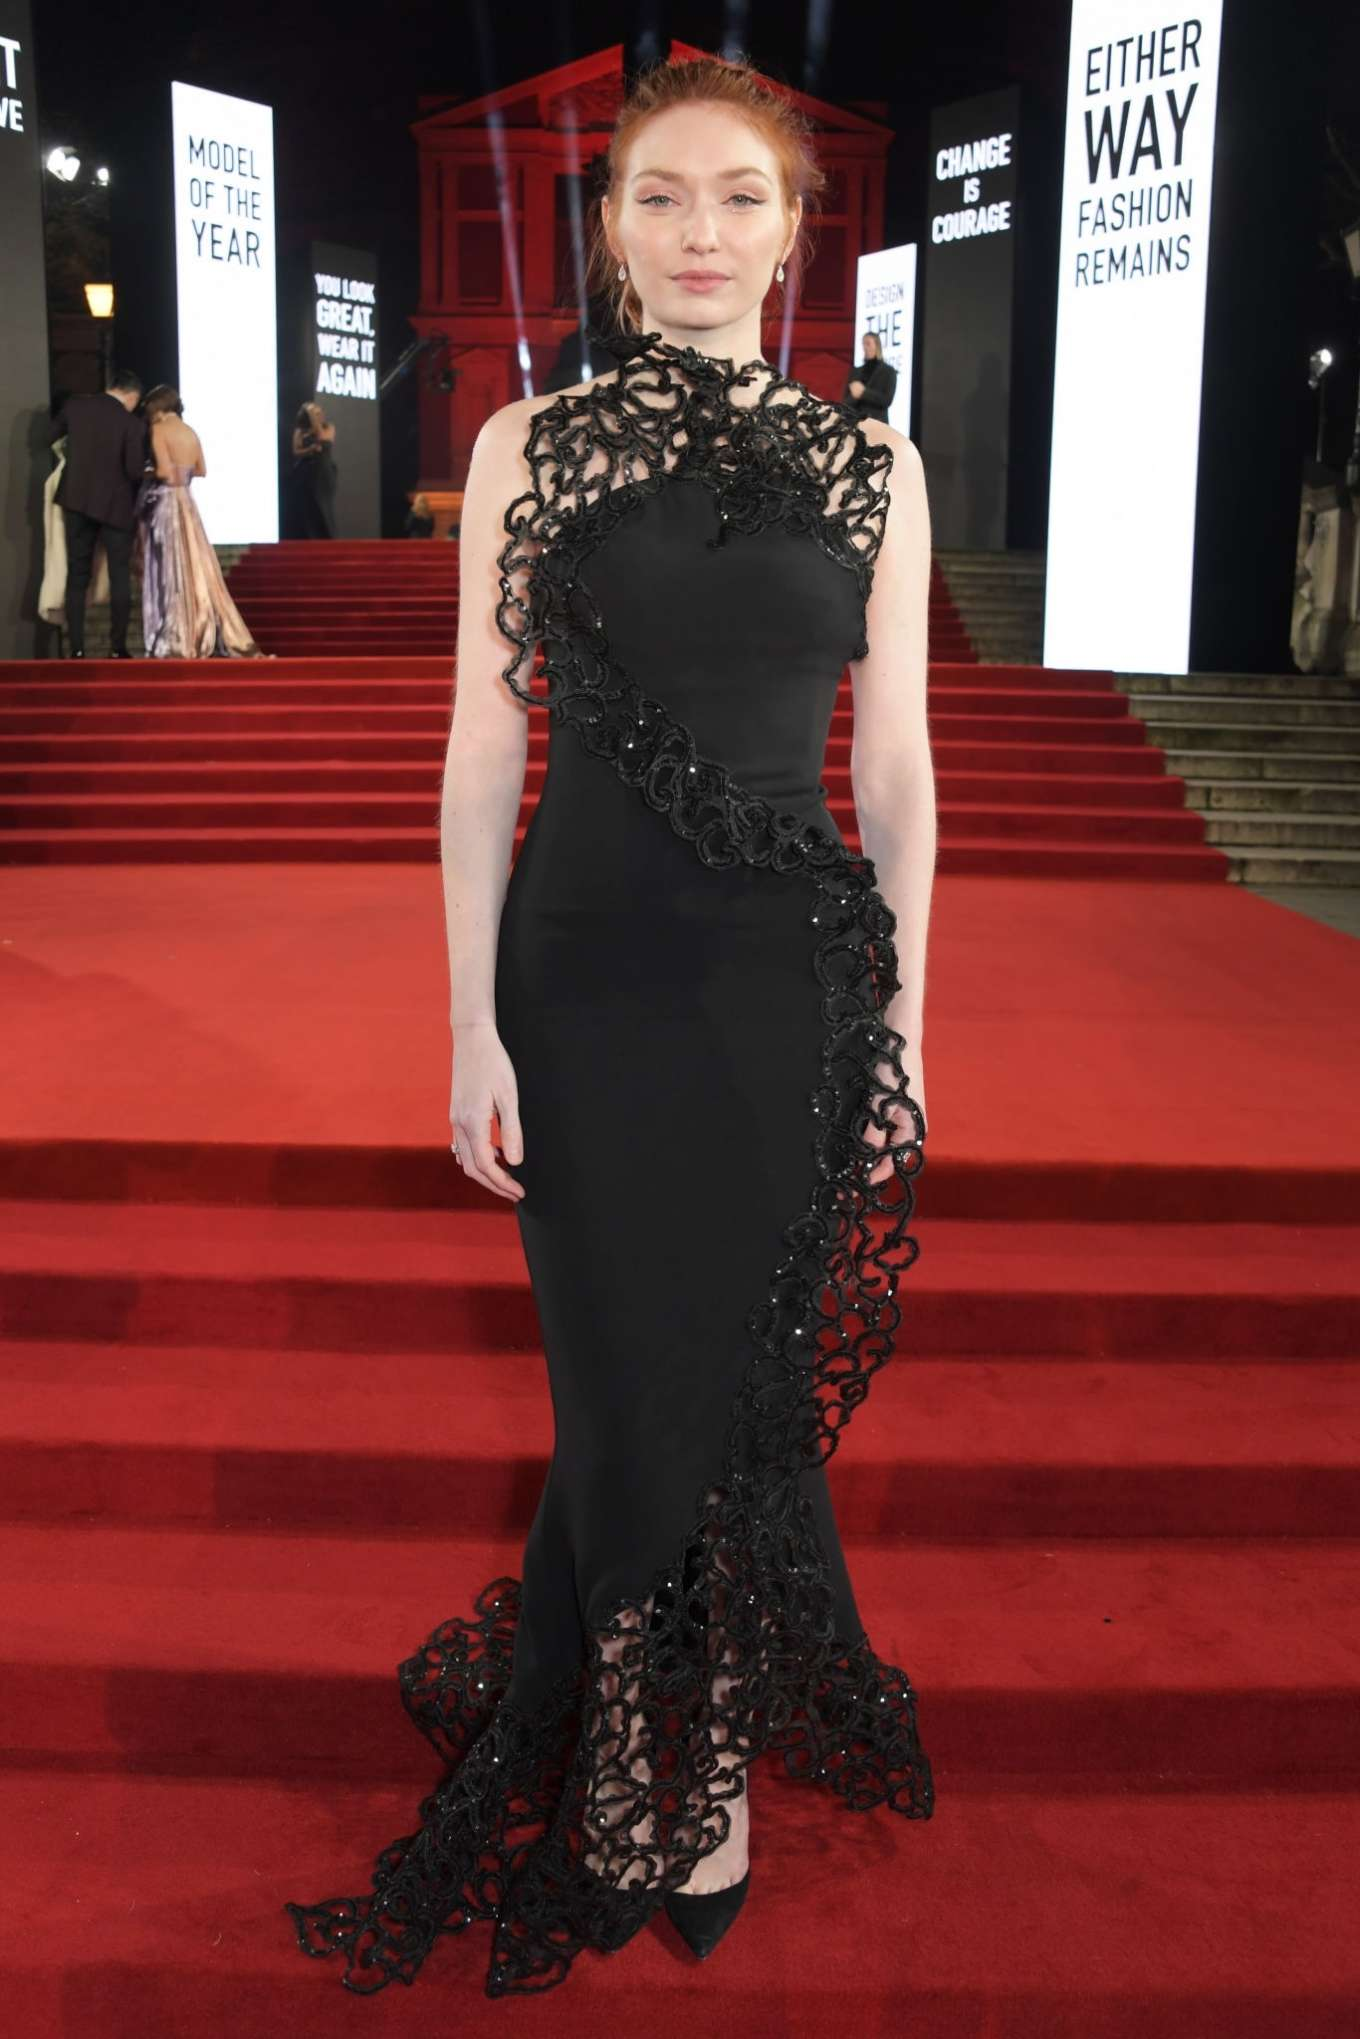 Eleanor Tomlinson 2019 : Eleanor Tomlinson – Fashion Awards 2019 in London-09